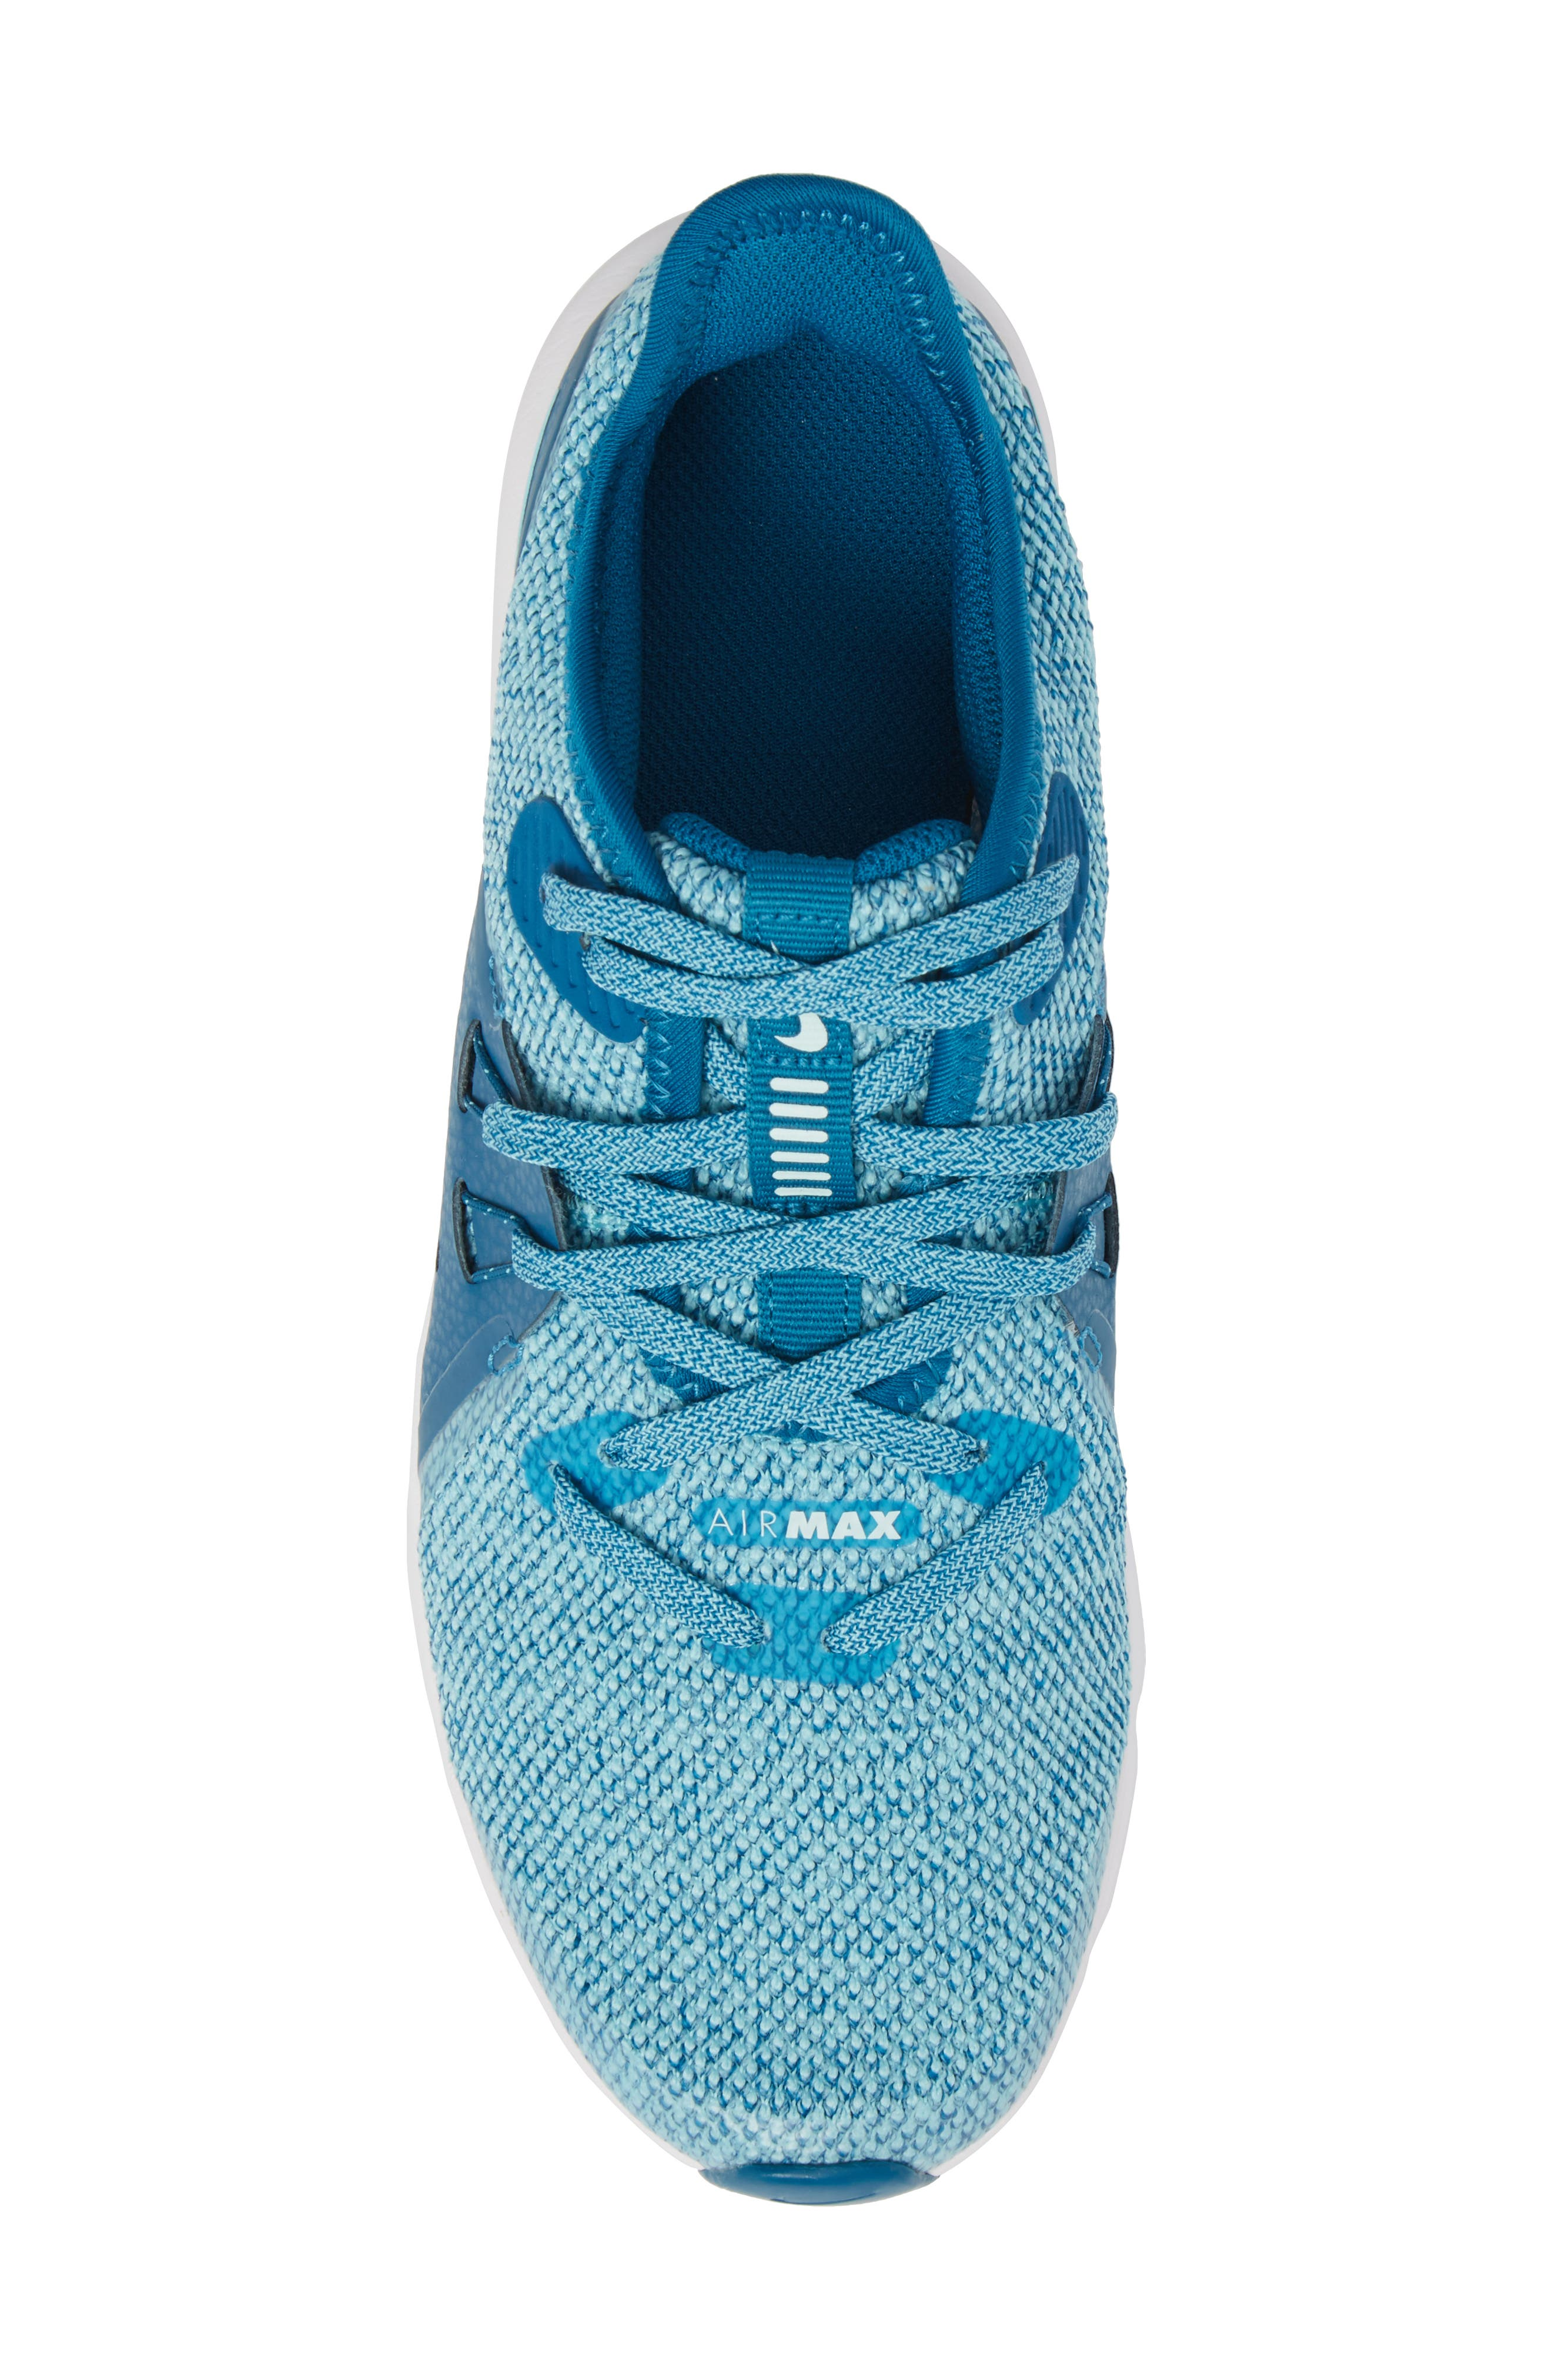 Air Max Sequent 3 GS Running Shoe,                             Alternate thumbnail 6, color,                             Green/ Igloo/ Bleached Aqua